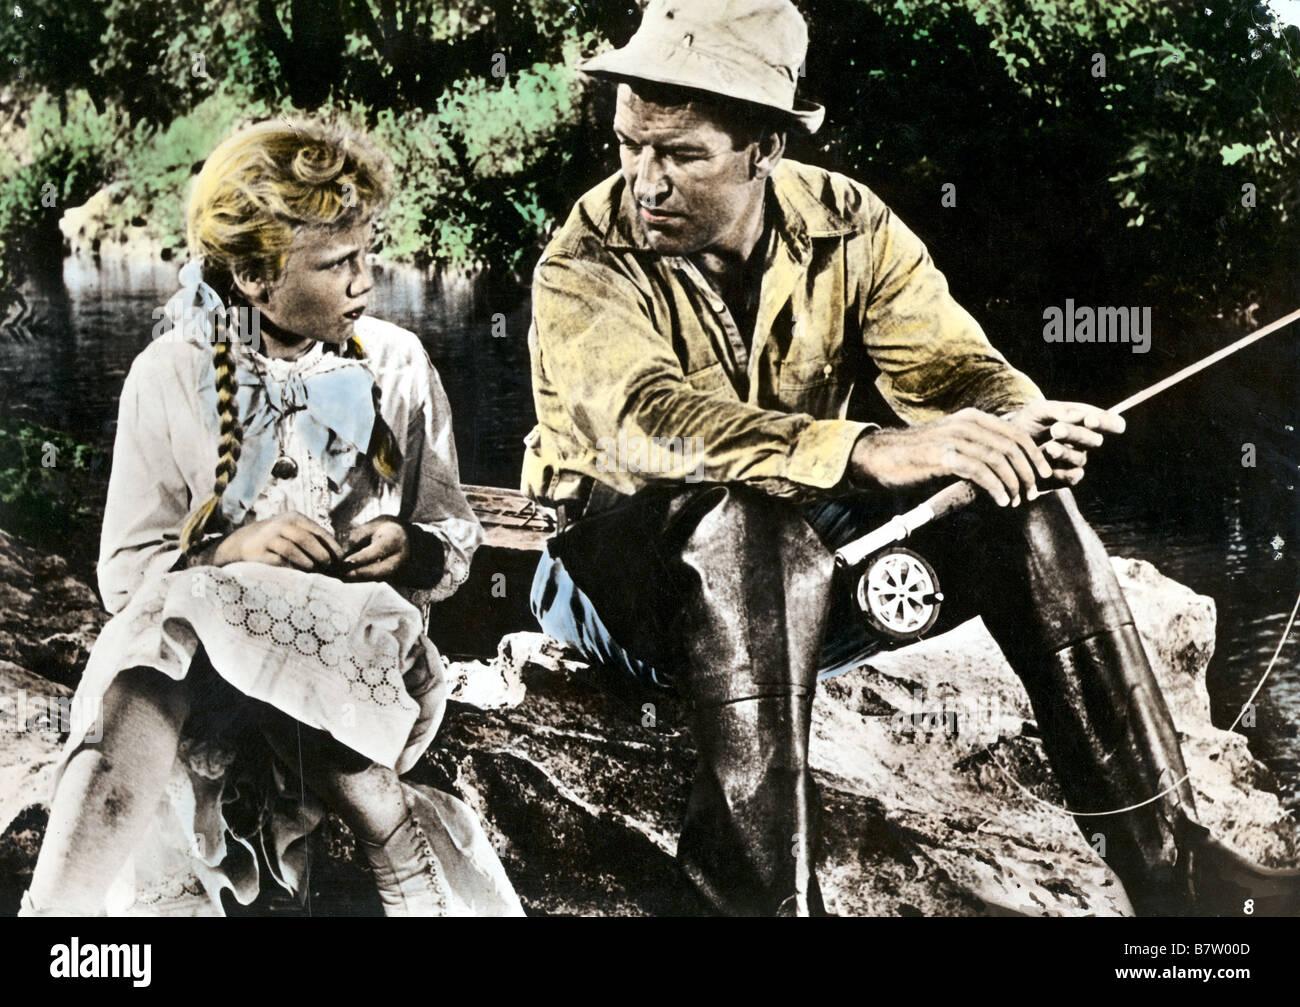 Pollyanna Pollyanna  Year: 1960 USA Hayley Mills, Richard Egan  Director: David Swift - Stock Image